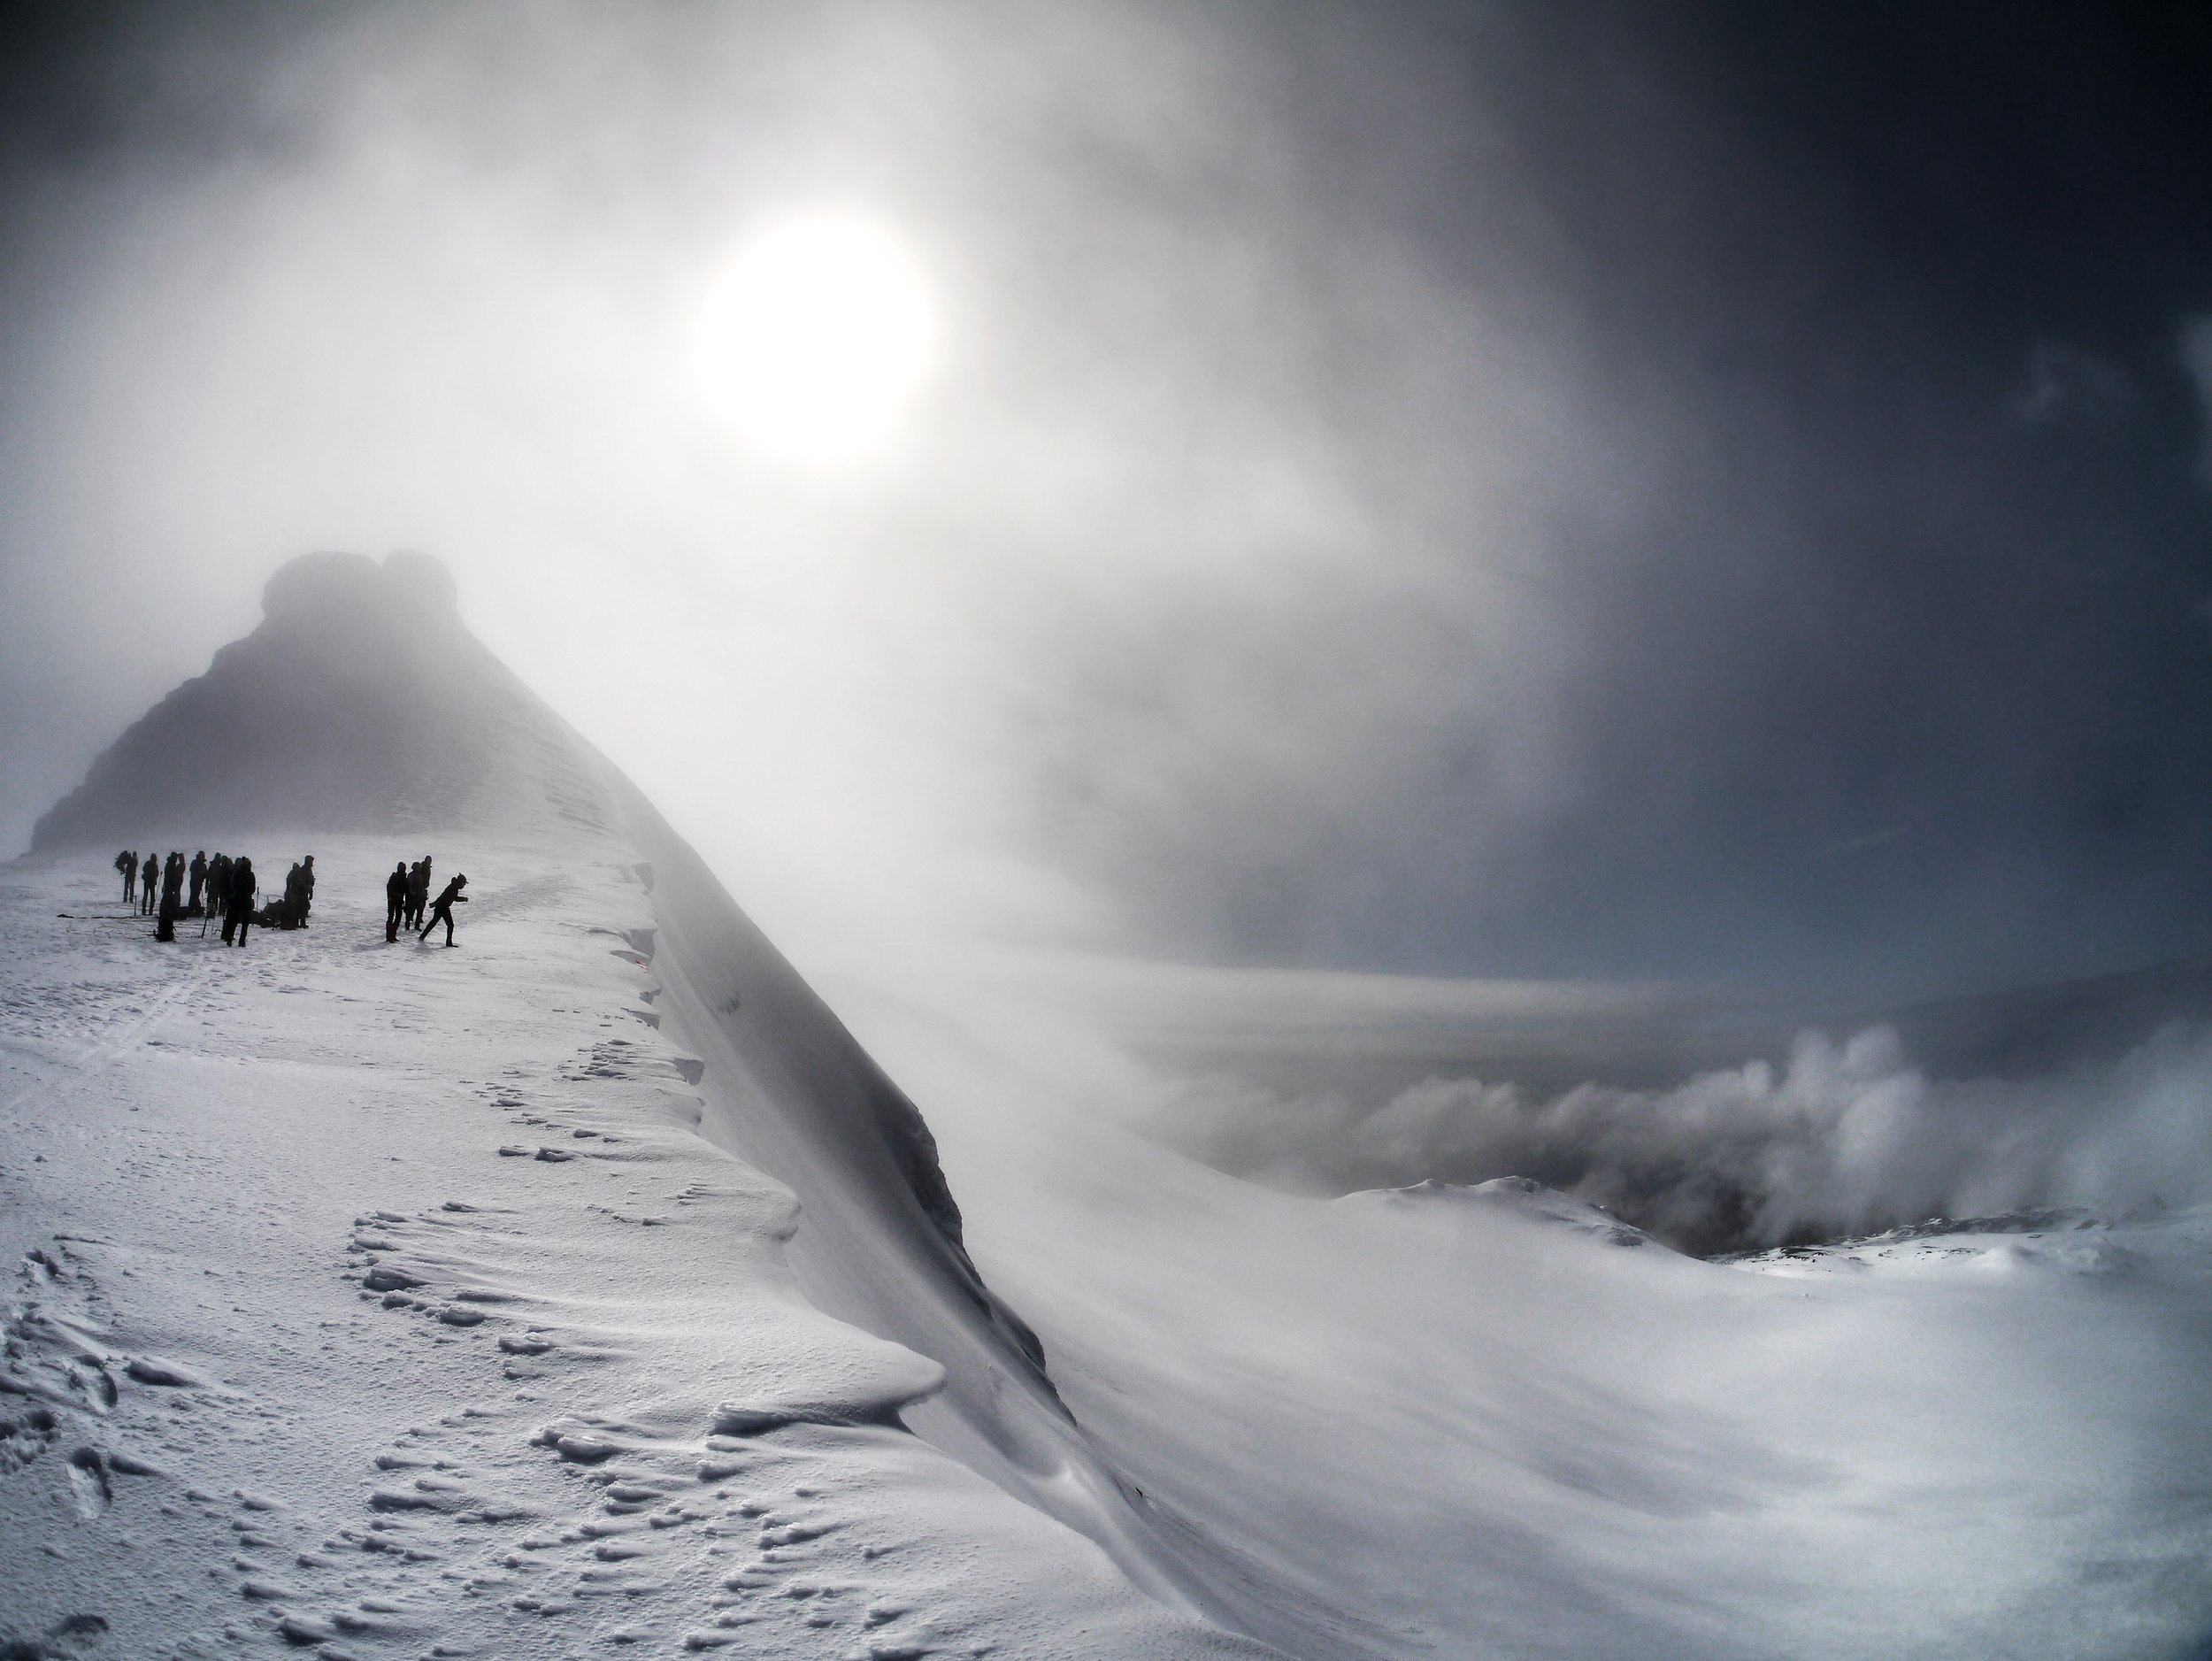 Admiring the summit view from Snæfellsjökull Glacier